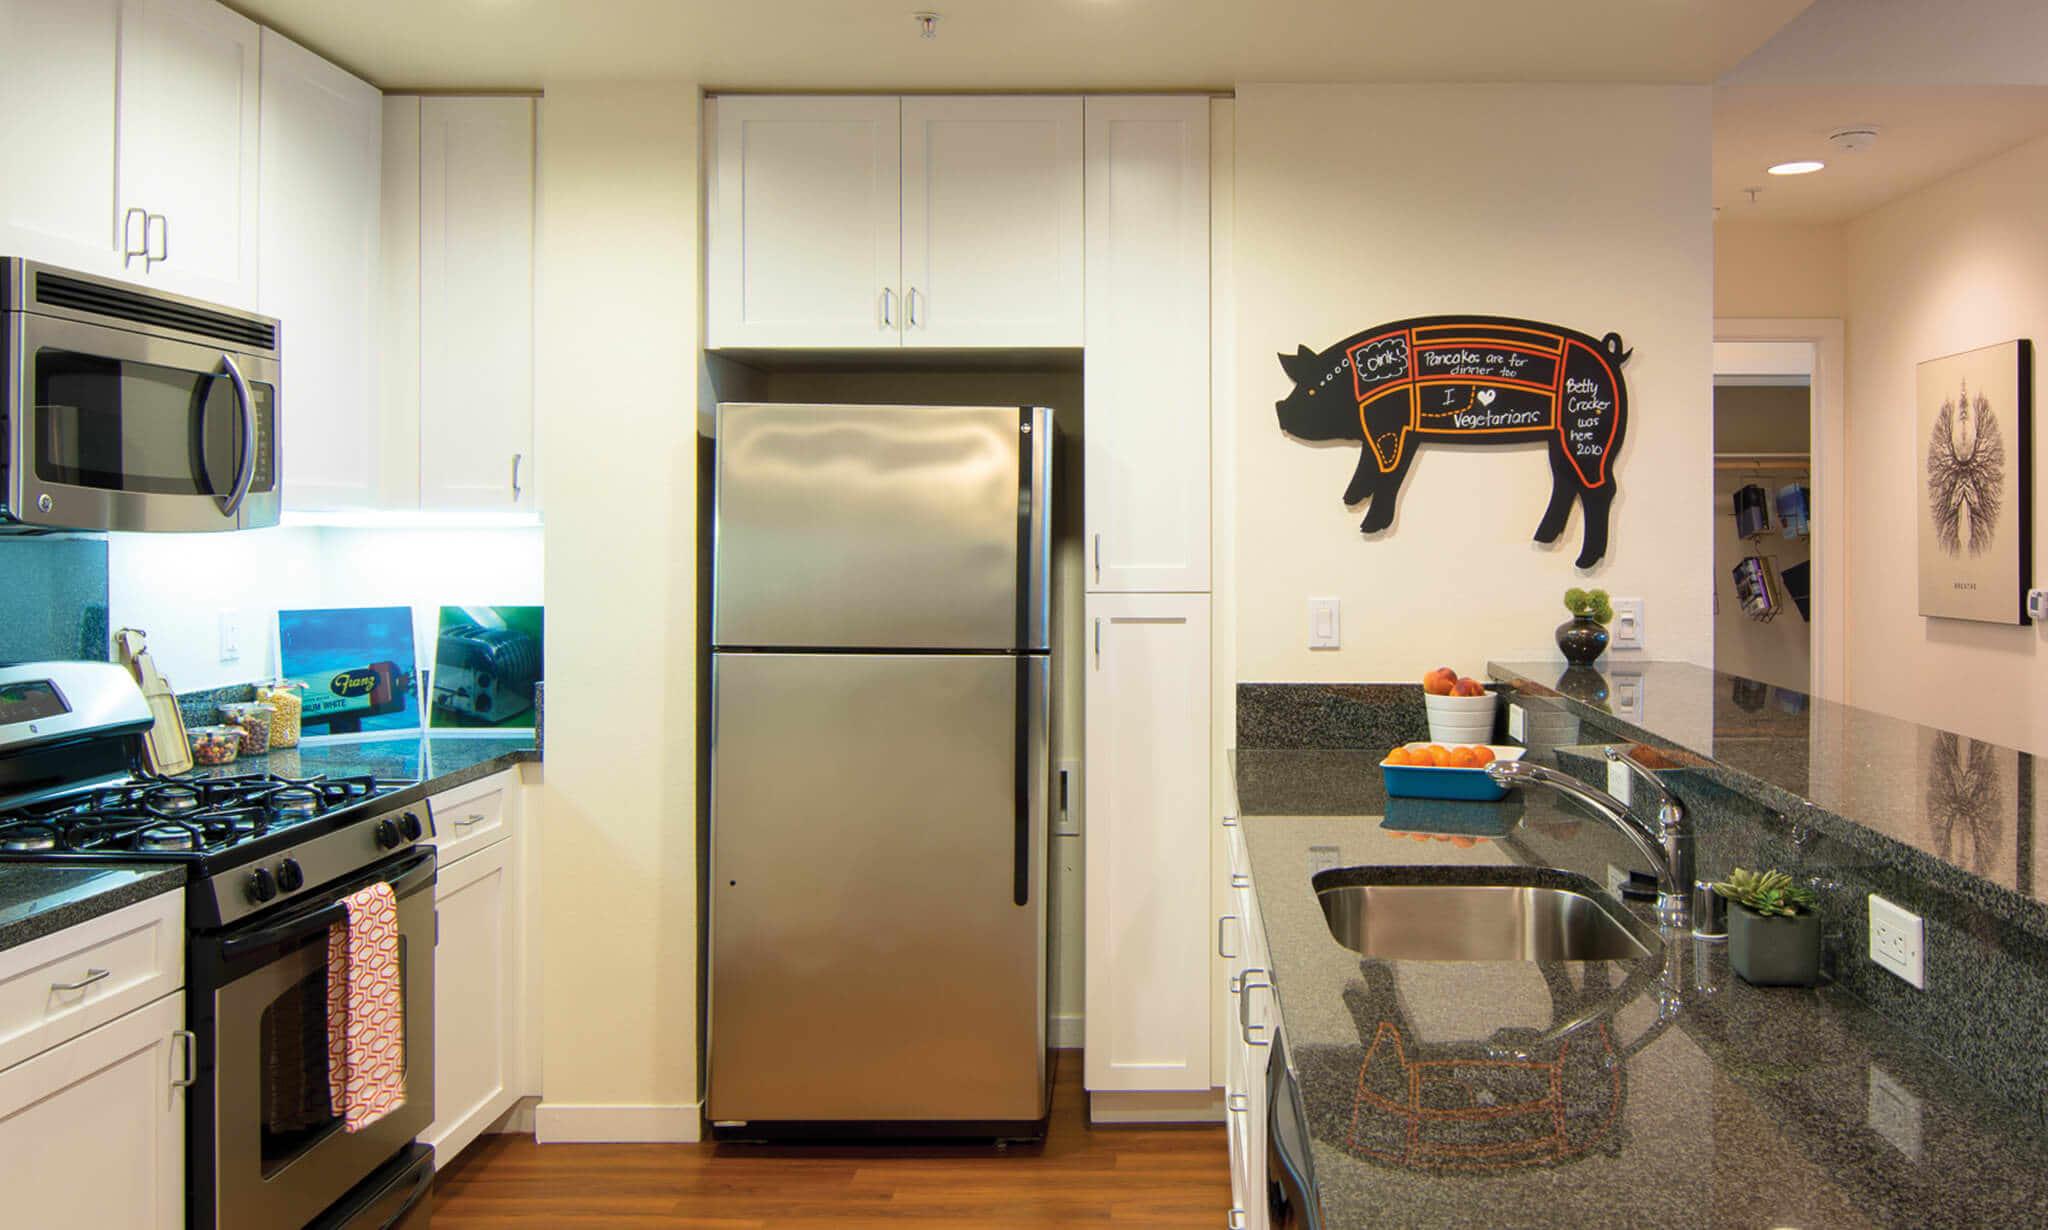 550 Moreland Apartments apartments in Santa Clara CA to rent photo 9